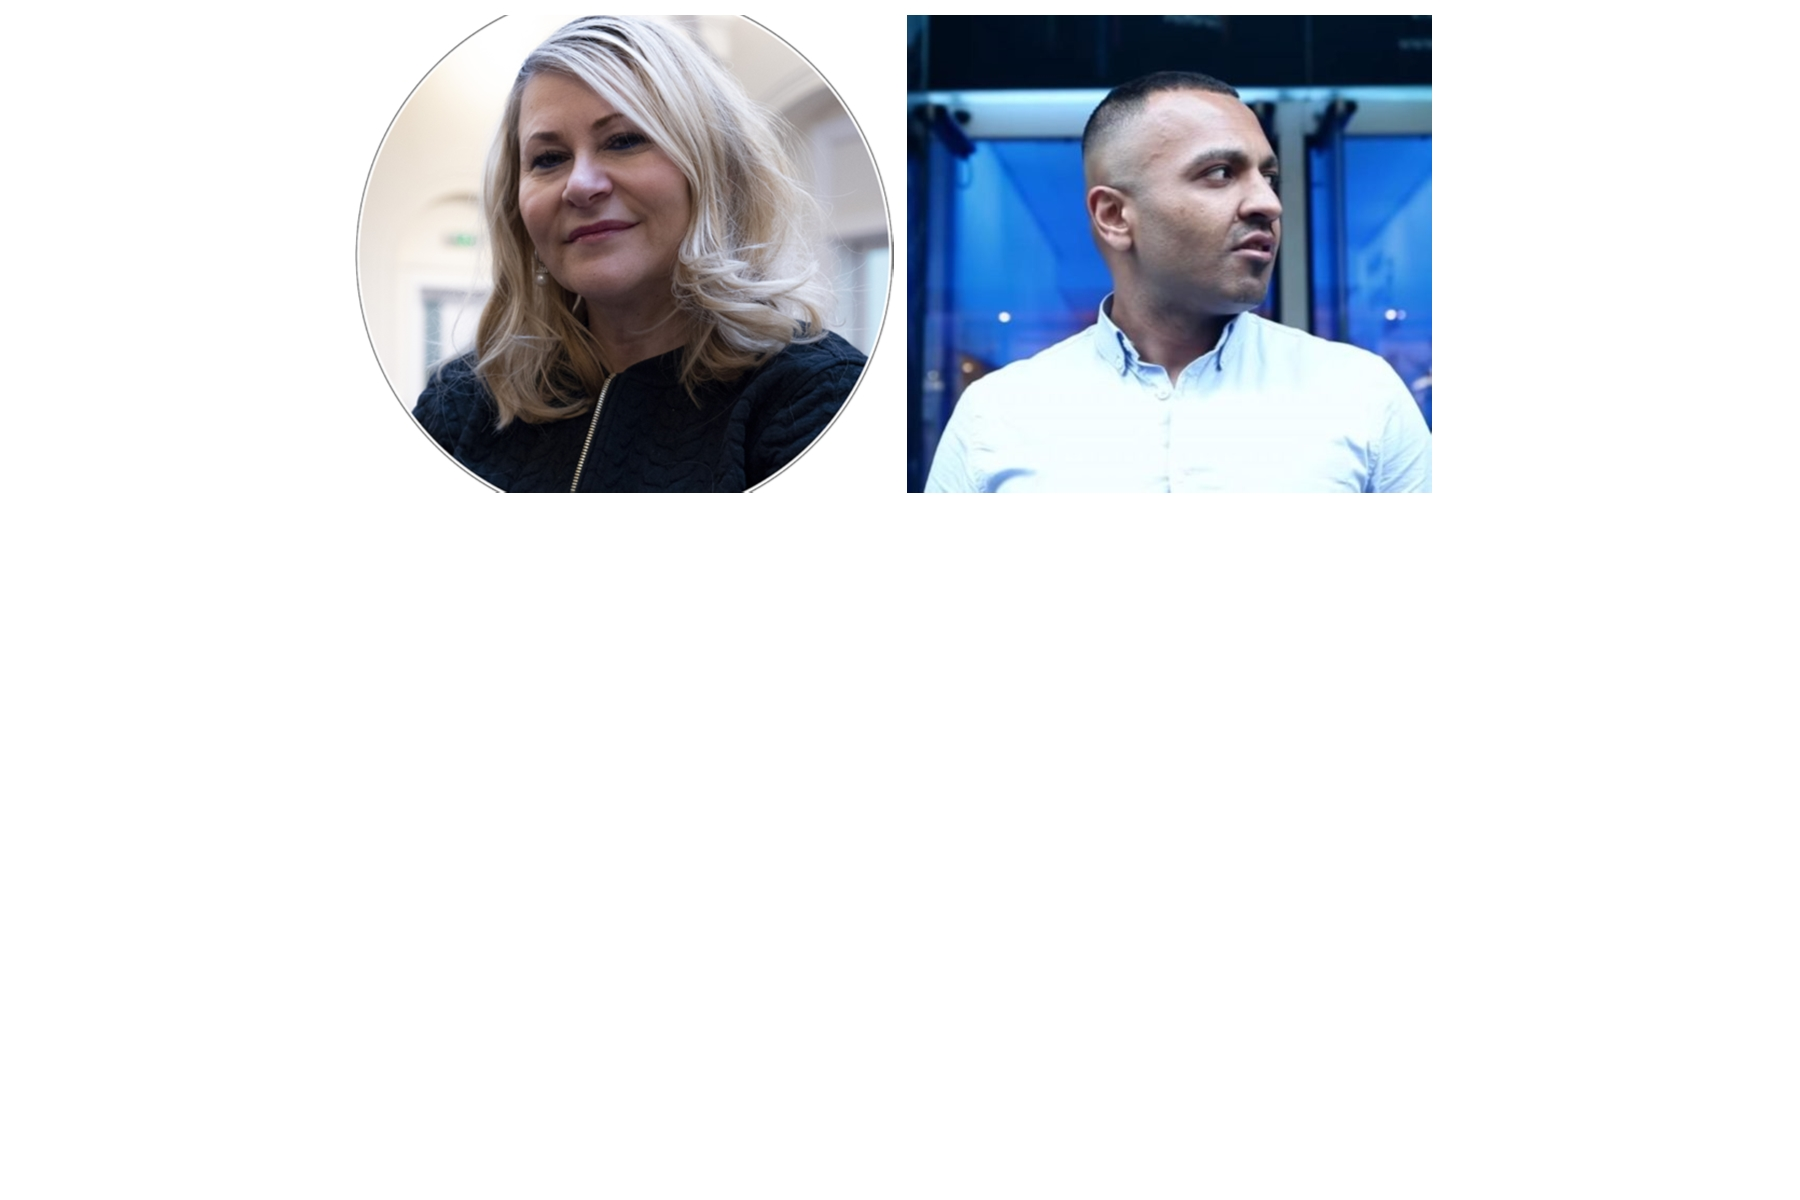 Racist Labour MSP Pauline McNeil vs Admirable Life Coach Adnan Ahmed